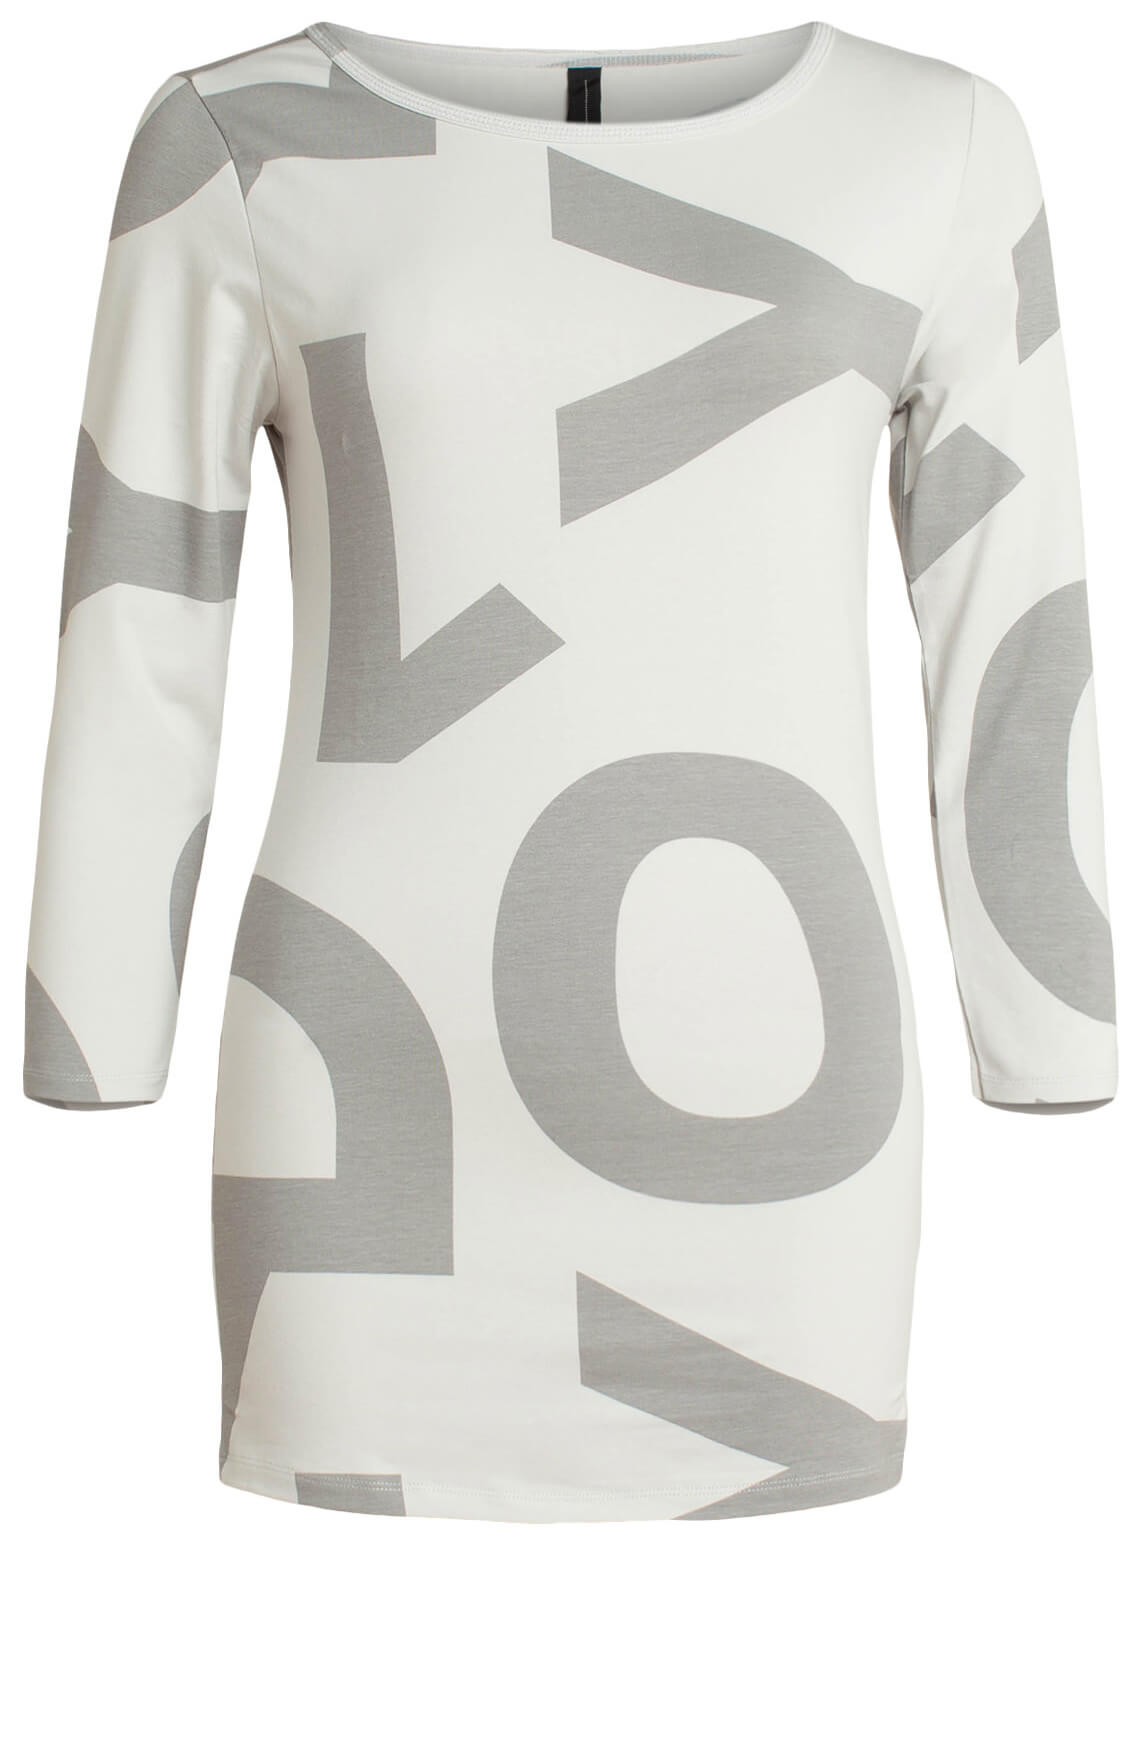 10 Days Dames Shirt met tekstprint Grijs